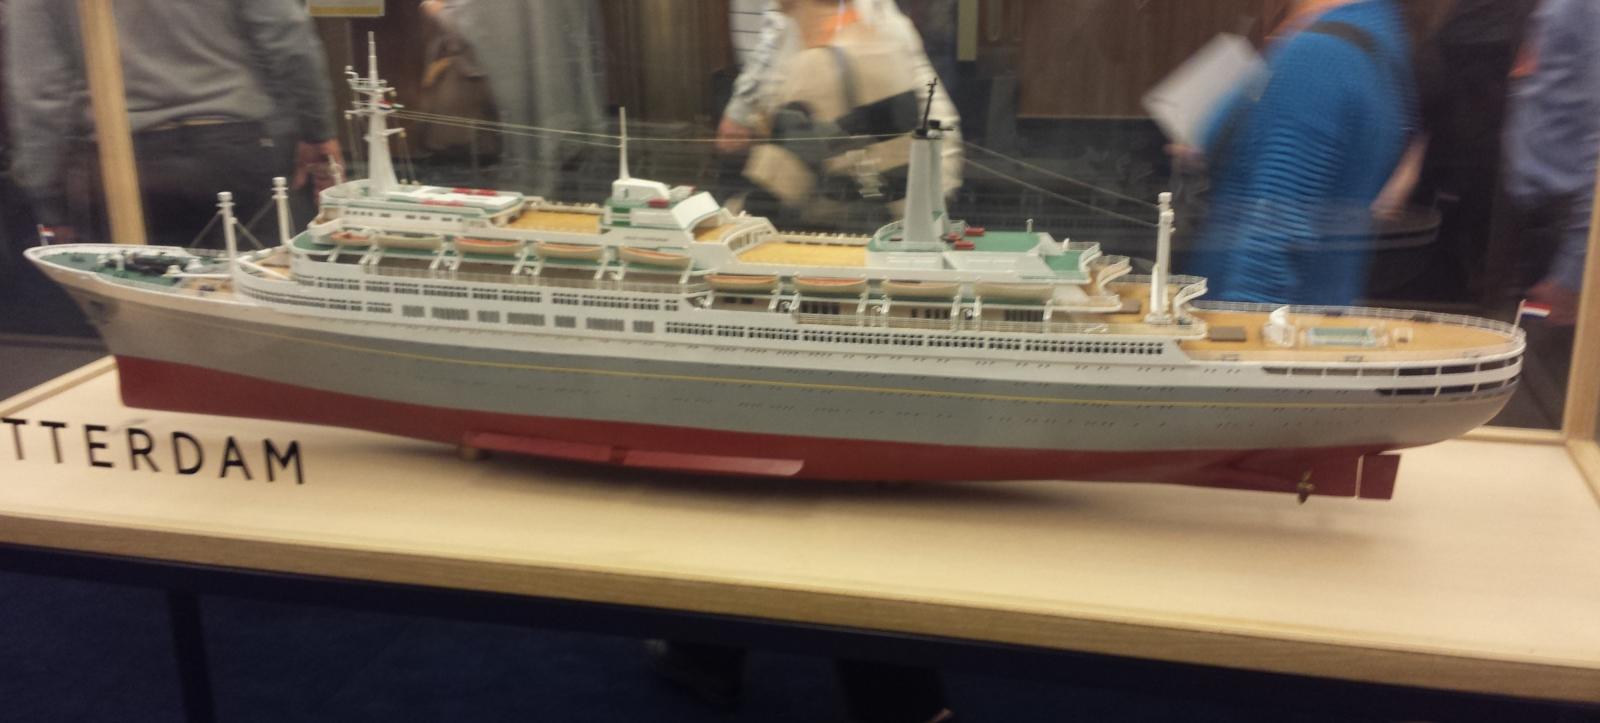 20140930_133457 SS Rotterdam